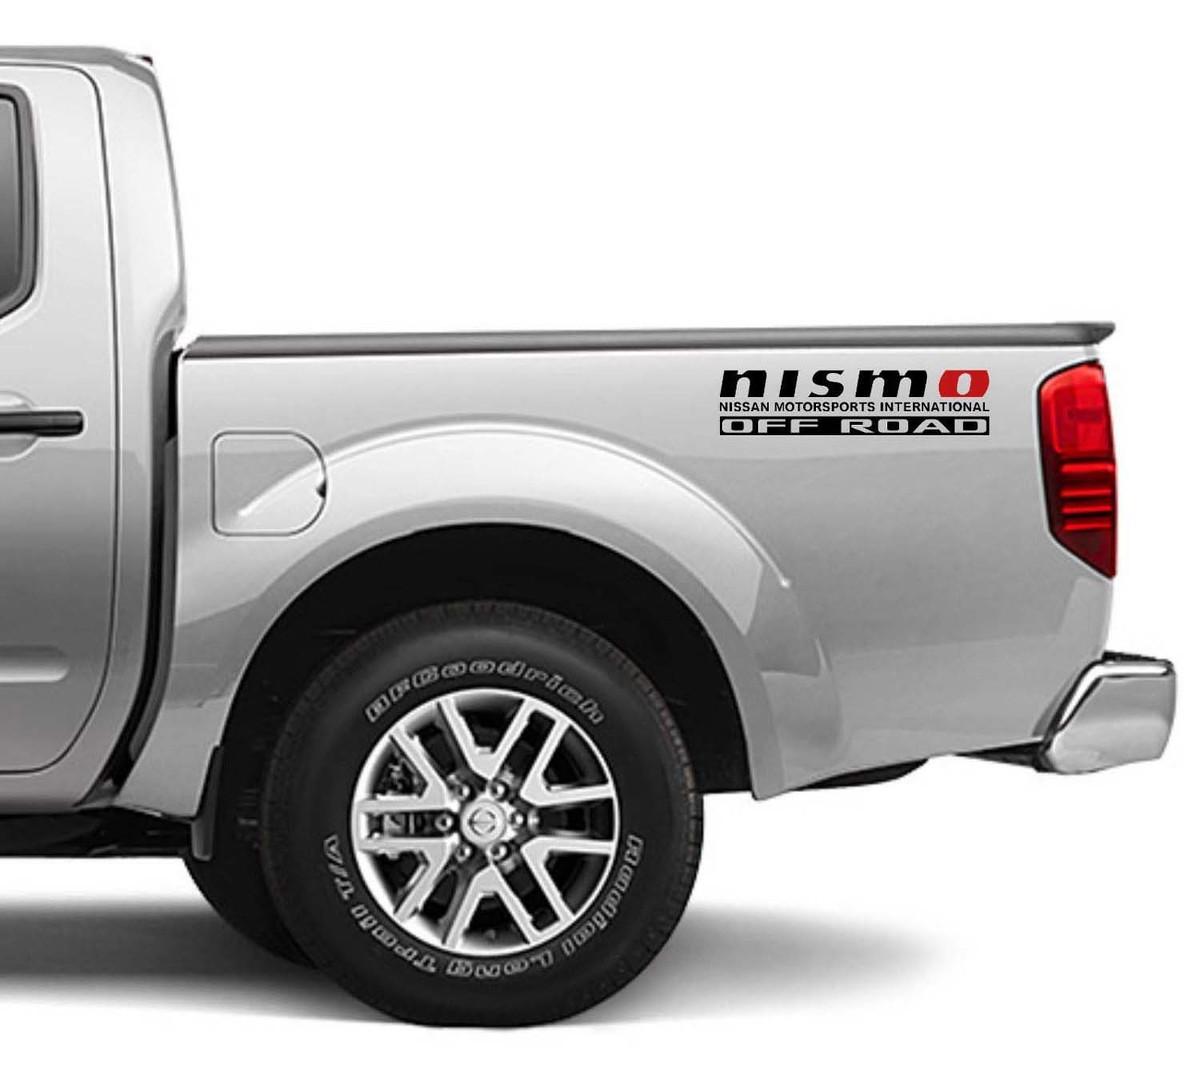 2X Nissan Frontier Vinyl Both Side Stickers Decals 4x4 Graphics nismo